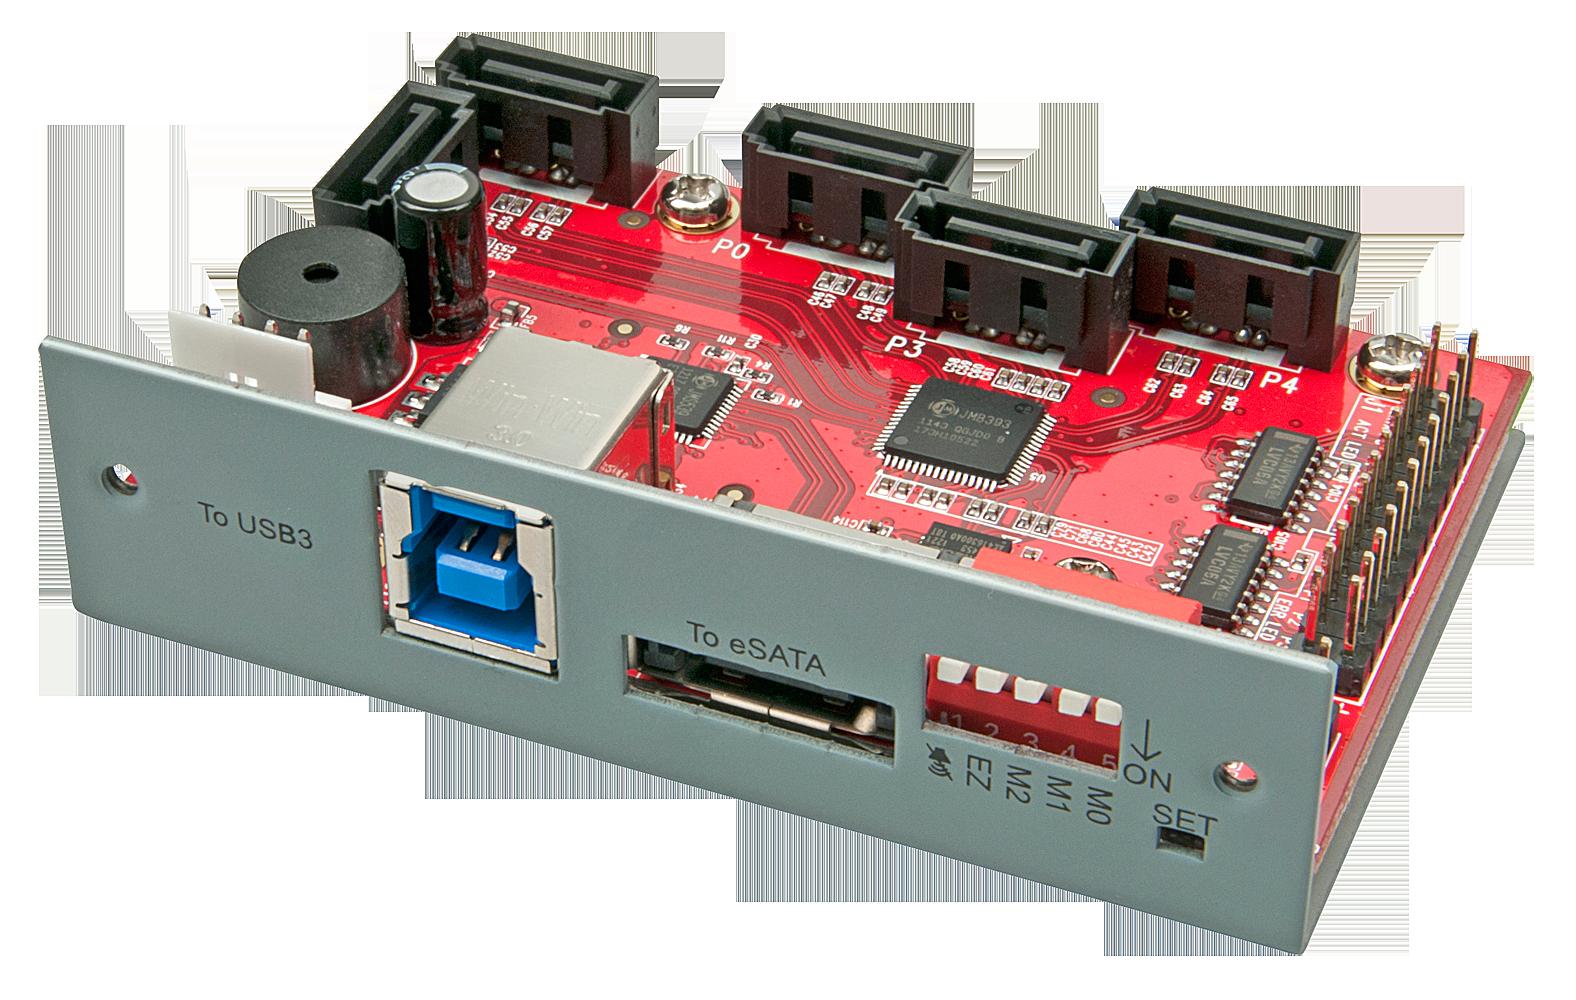 USB 3.0 & eSATA an 5x SATA RAID Adapter f�r externe Laufwerksgeh�use